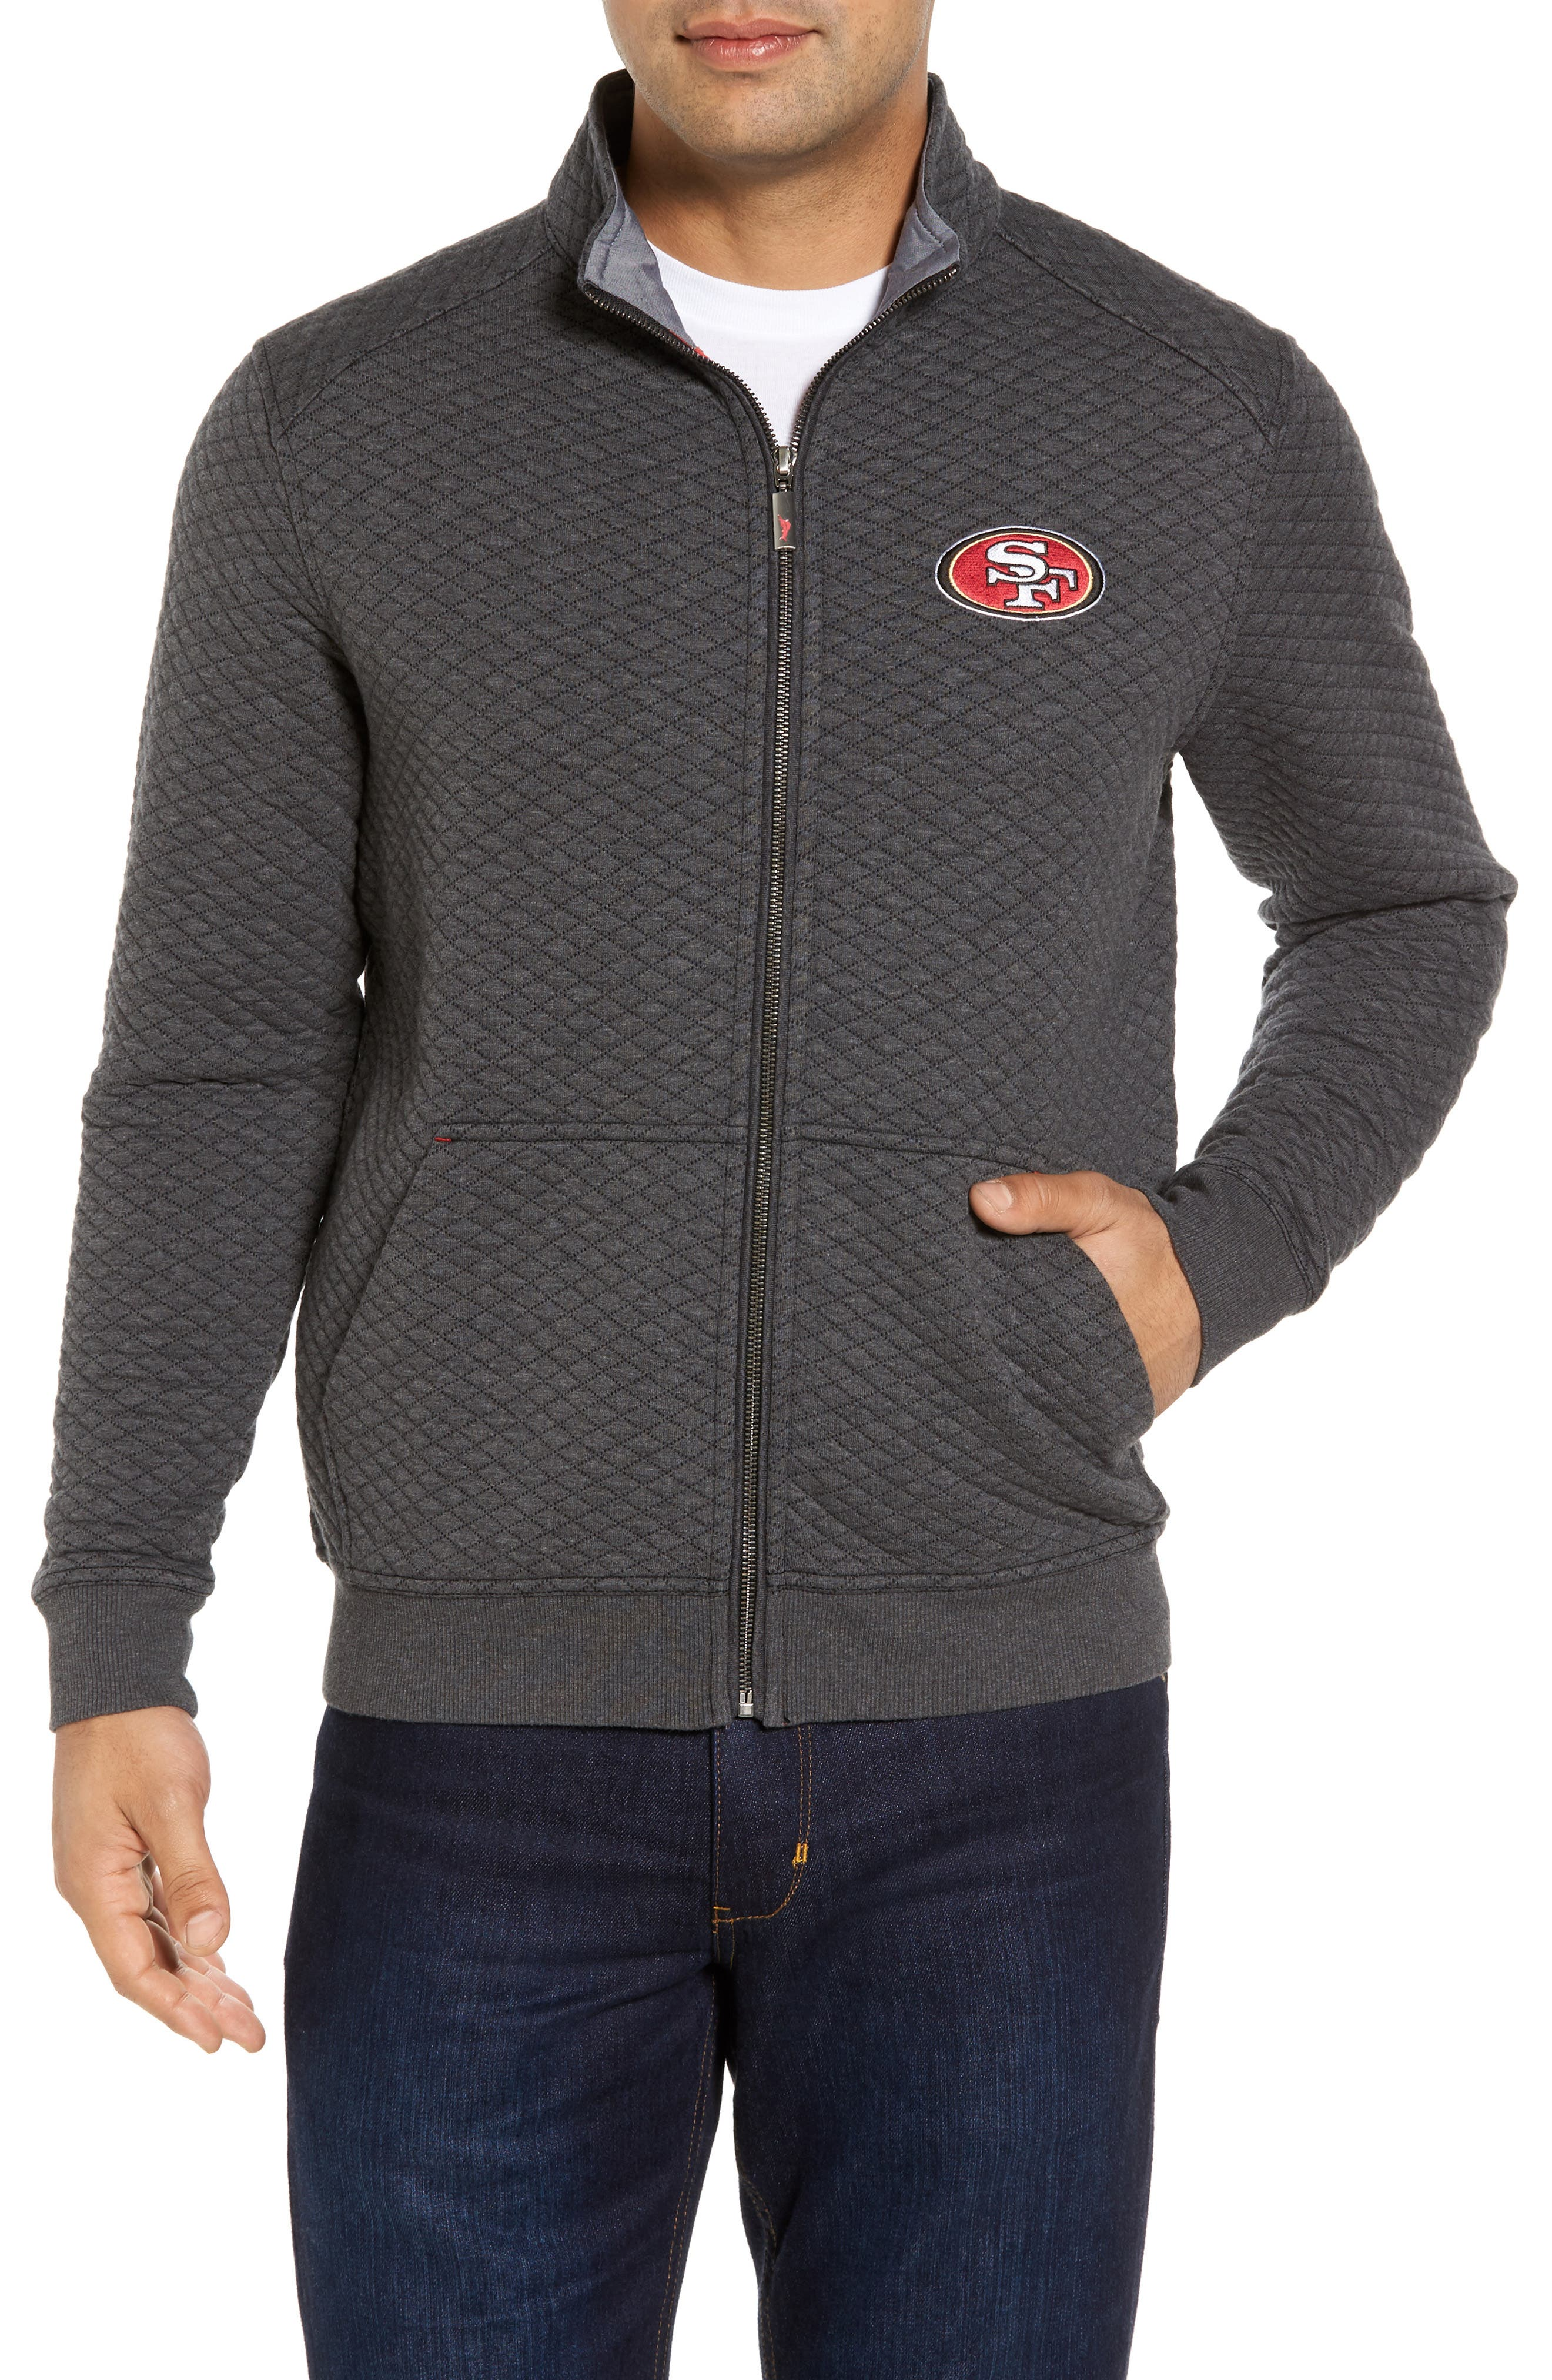 NFL Quiltessential Full Zip Sweatshirt,                             Main thumbnail 1, color,                             020